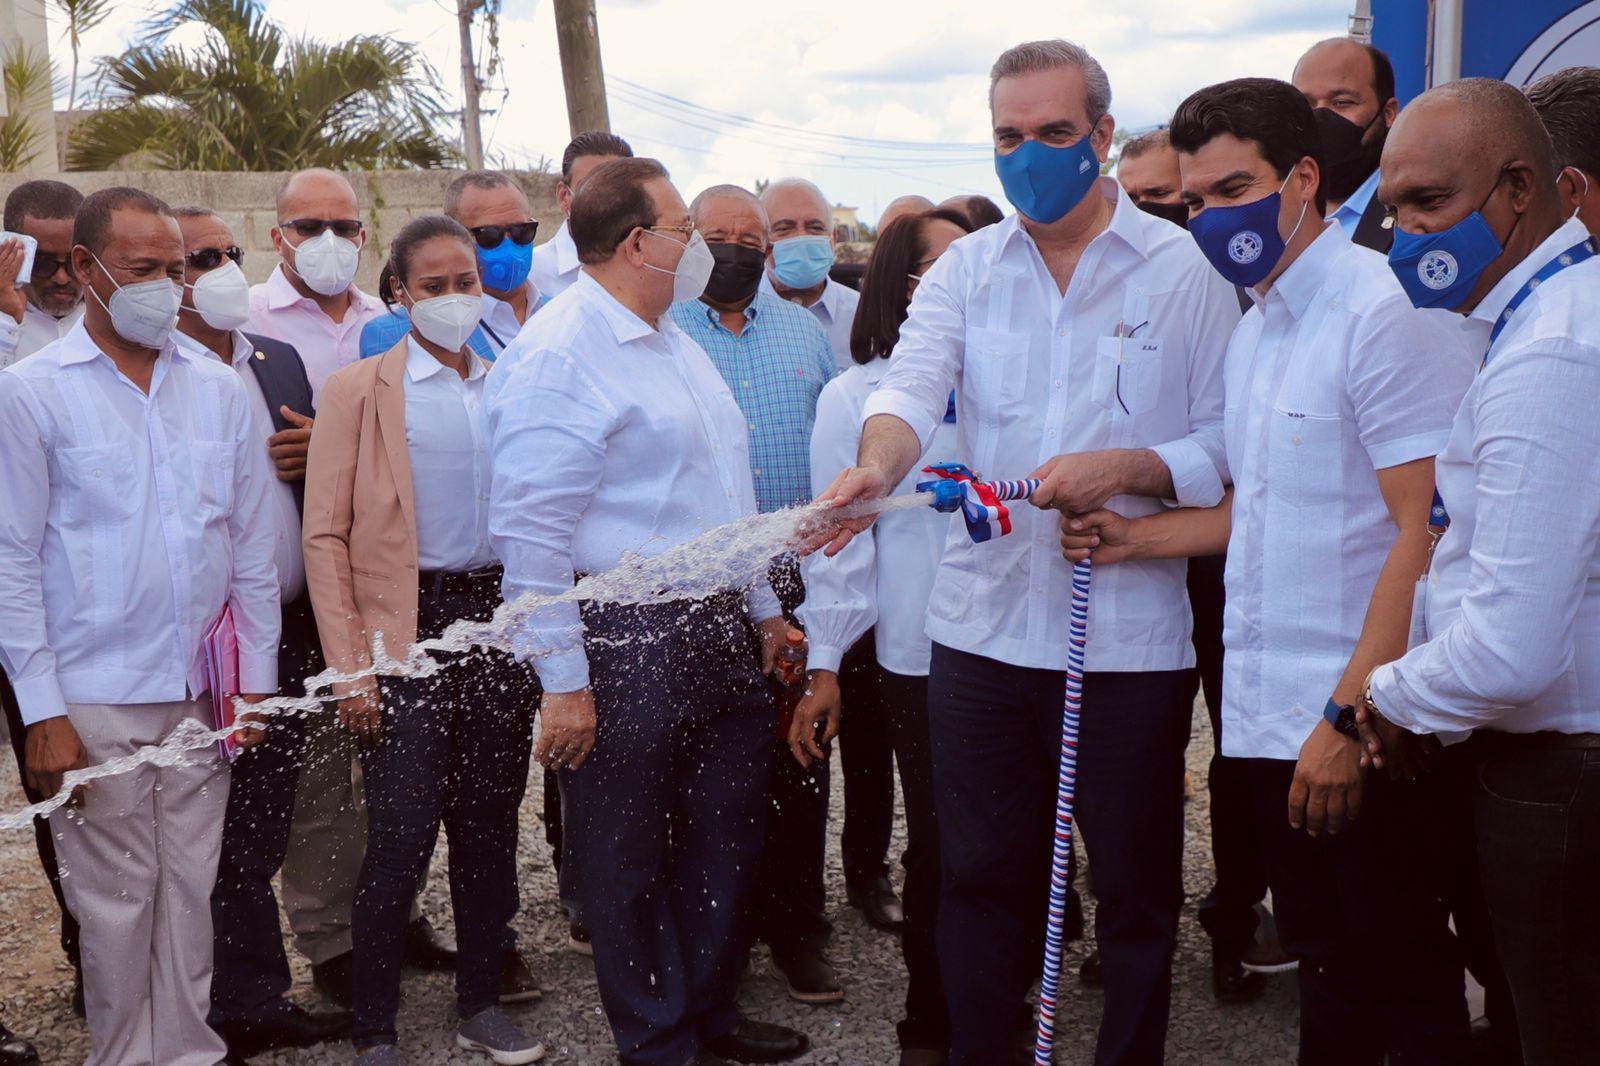 Presidente Abinader inaugura en Hato Mayor sistema de agua potable en beneficio de 6,500 comunitarios